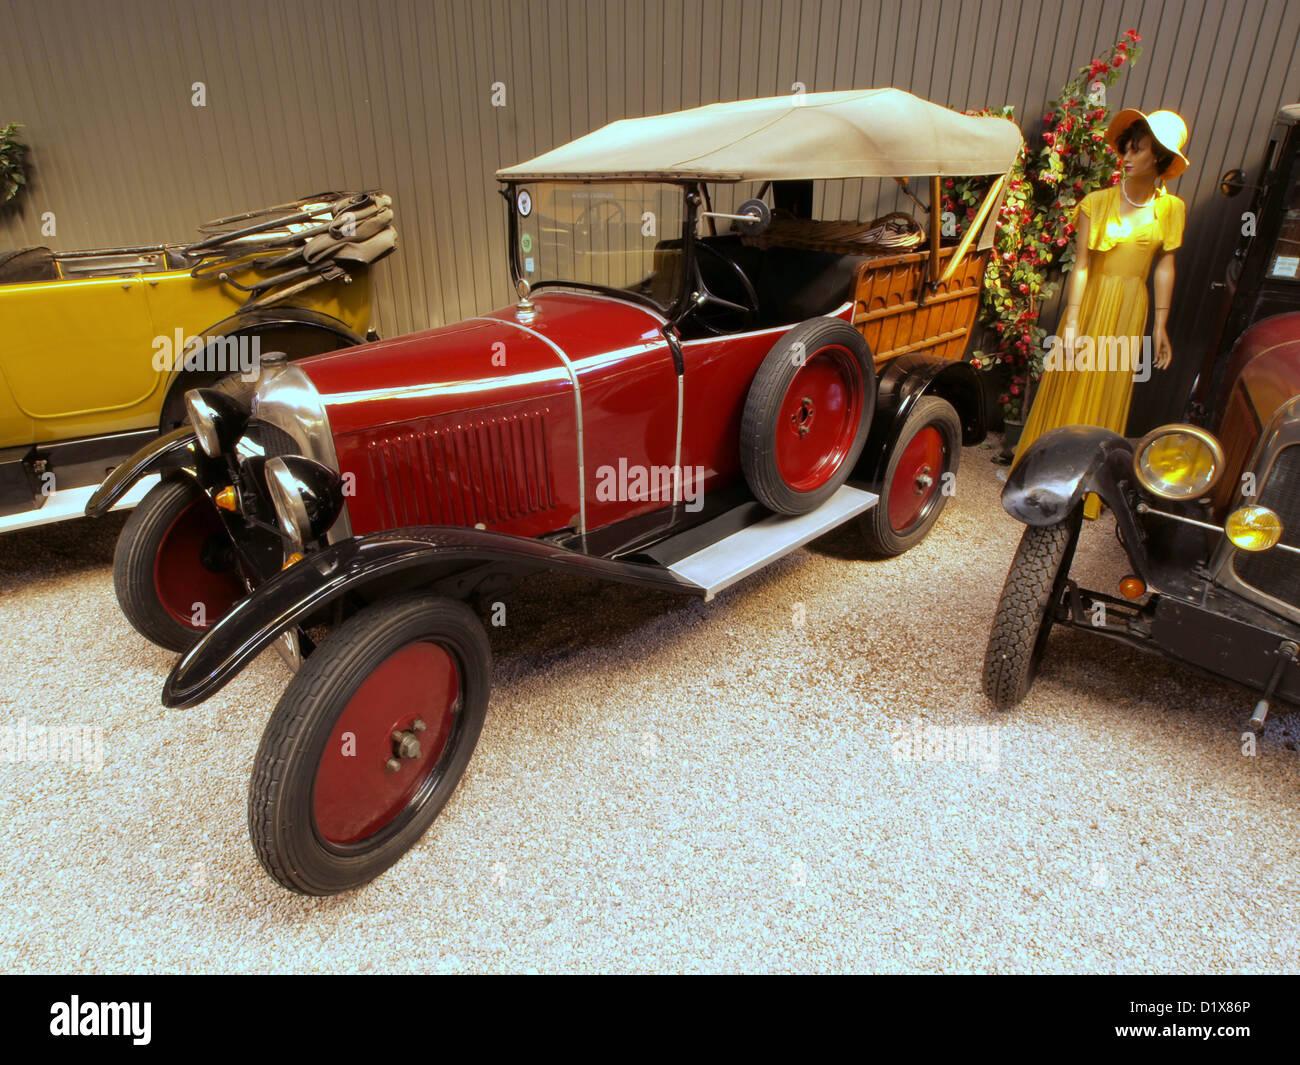 automobile museum reims champagne 1925 citroen c3 stock photo royalty free image 52822974 alamy. Black Bedroom Furniture Sets. Home Design Ideas